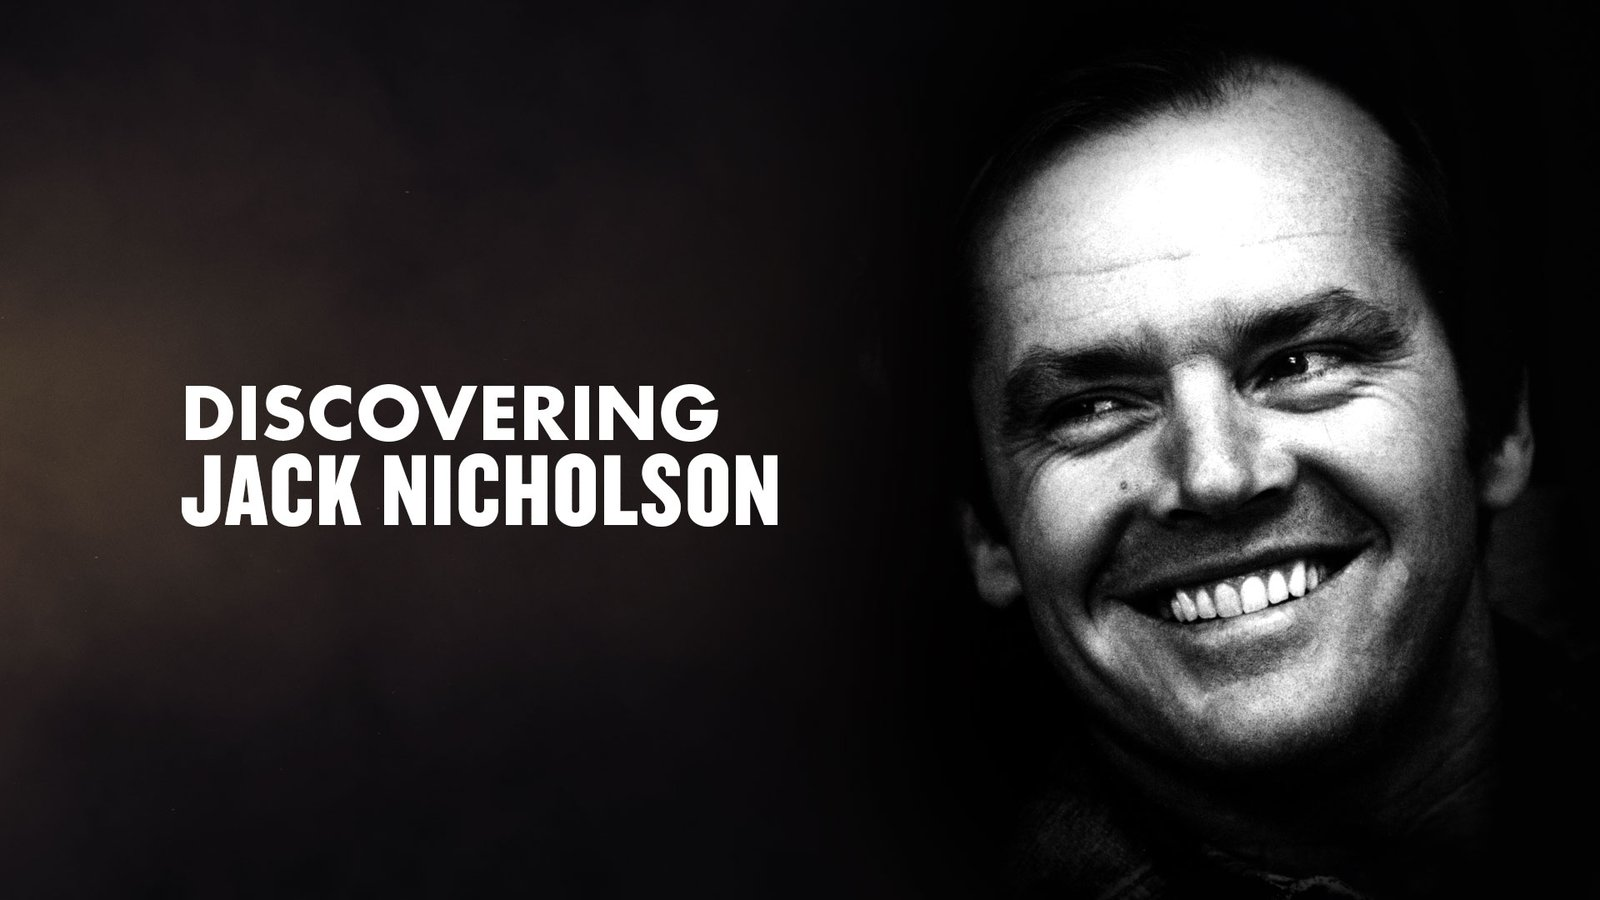 Discovering Jack Nicholson